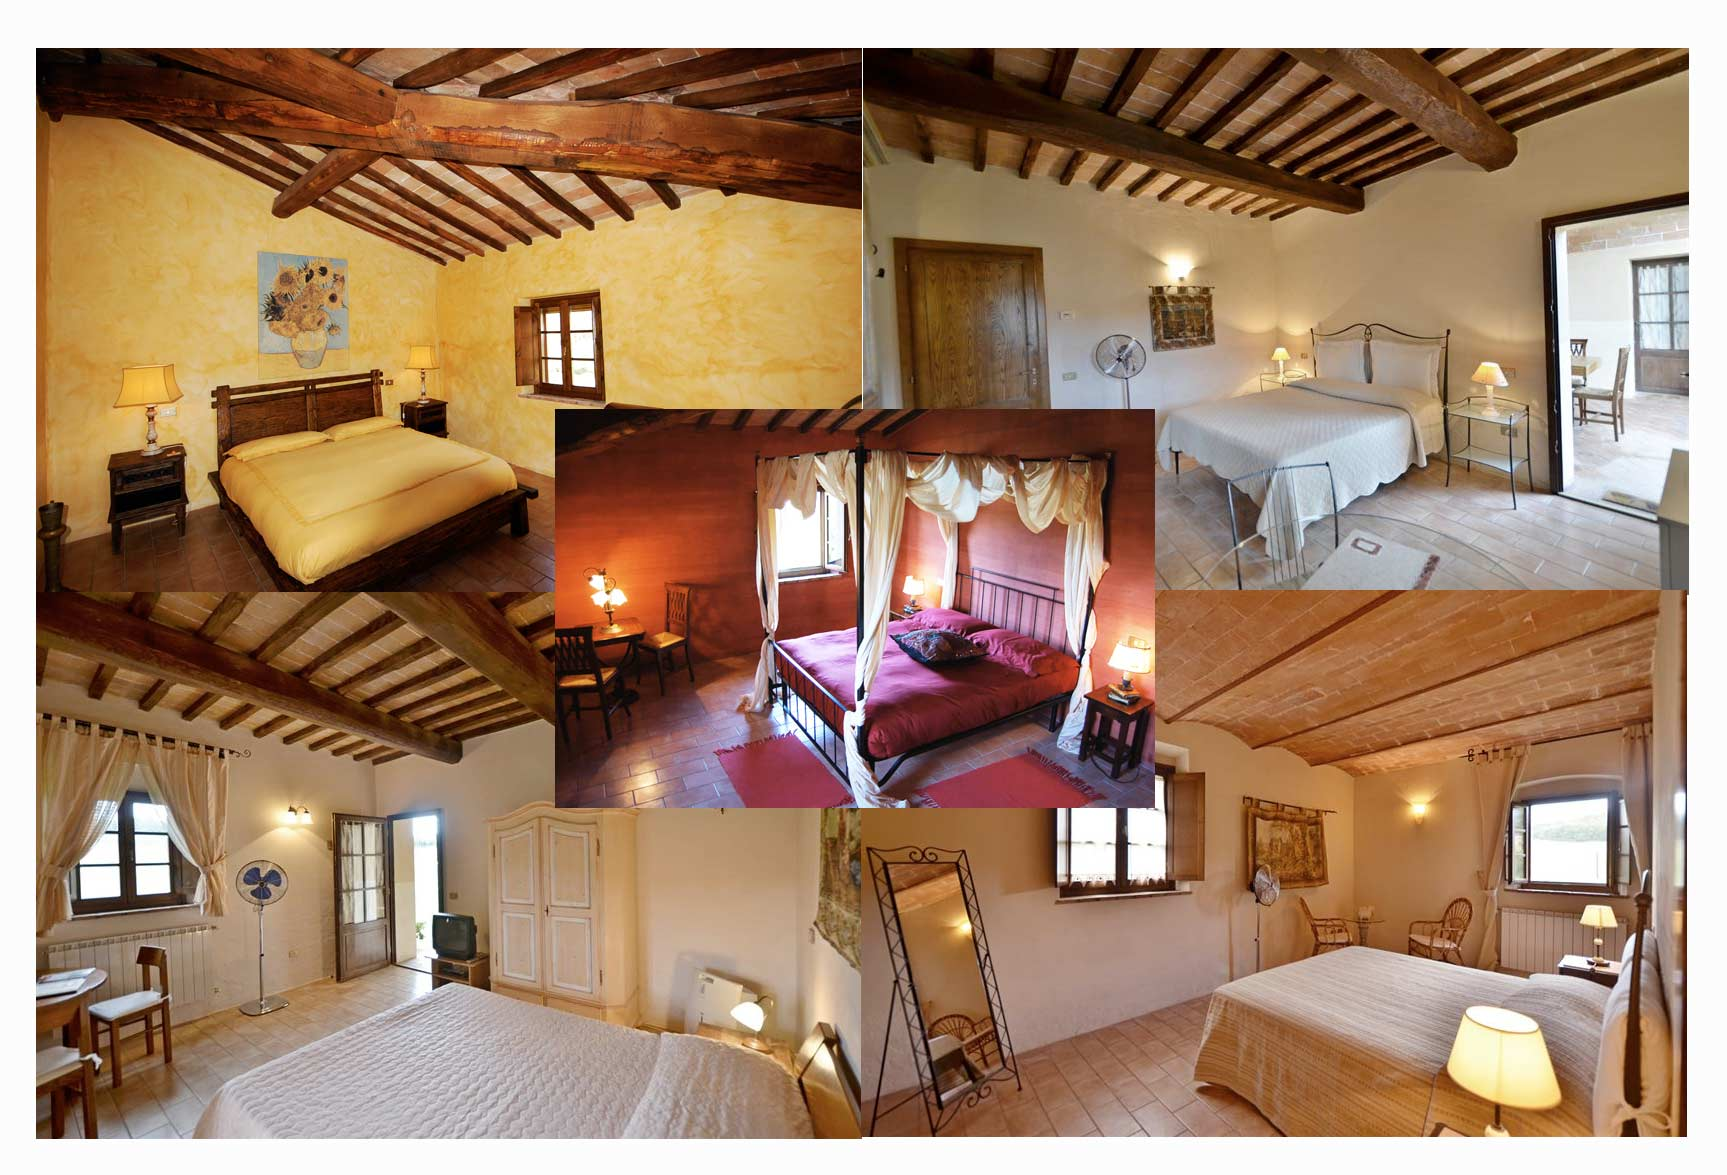 casale in toscana con 5 camere da letto villa toscana blog